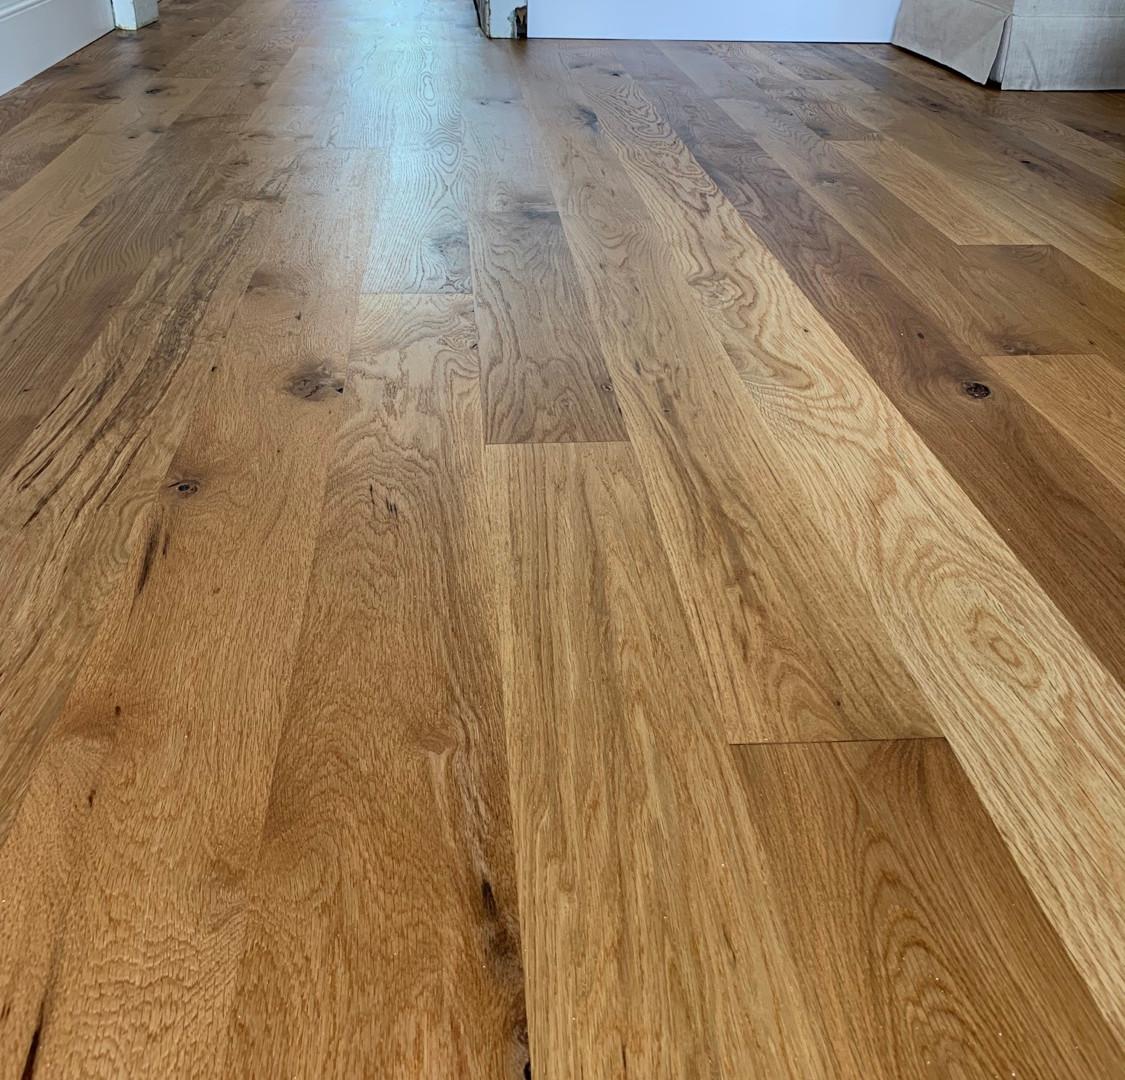 Rustic white oak with magic oil 2k finish